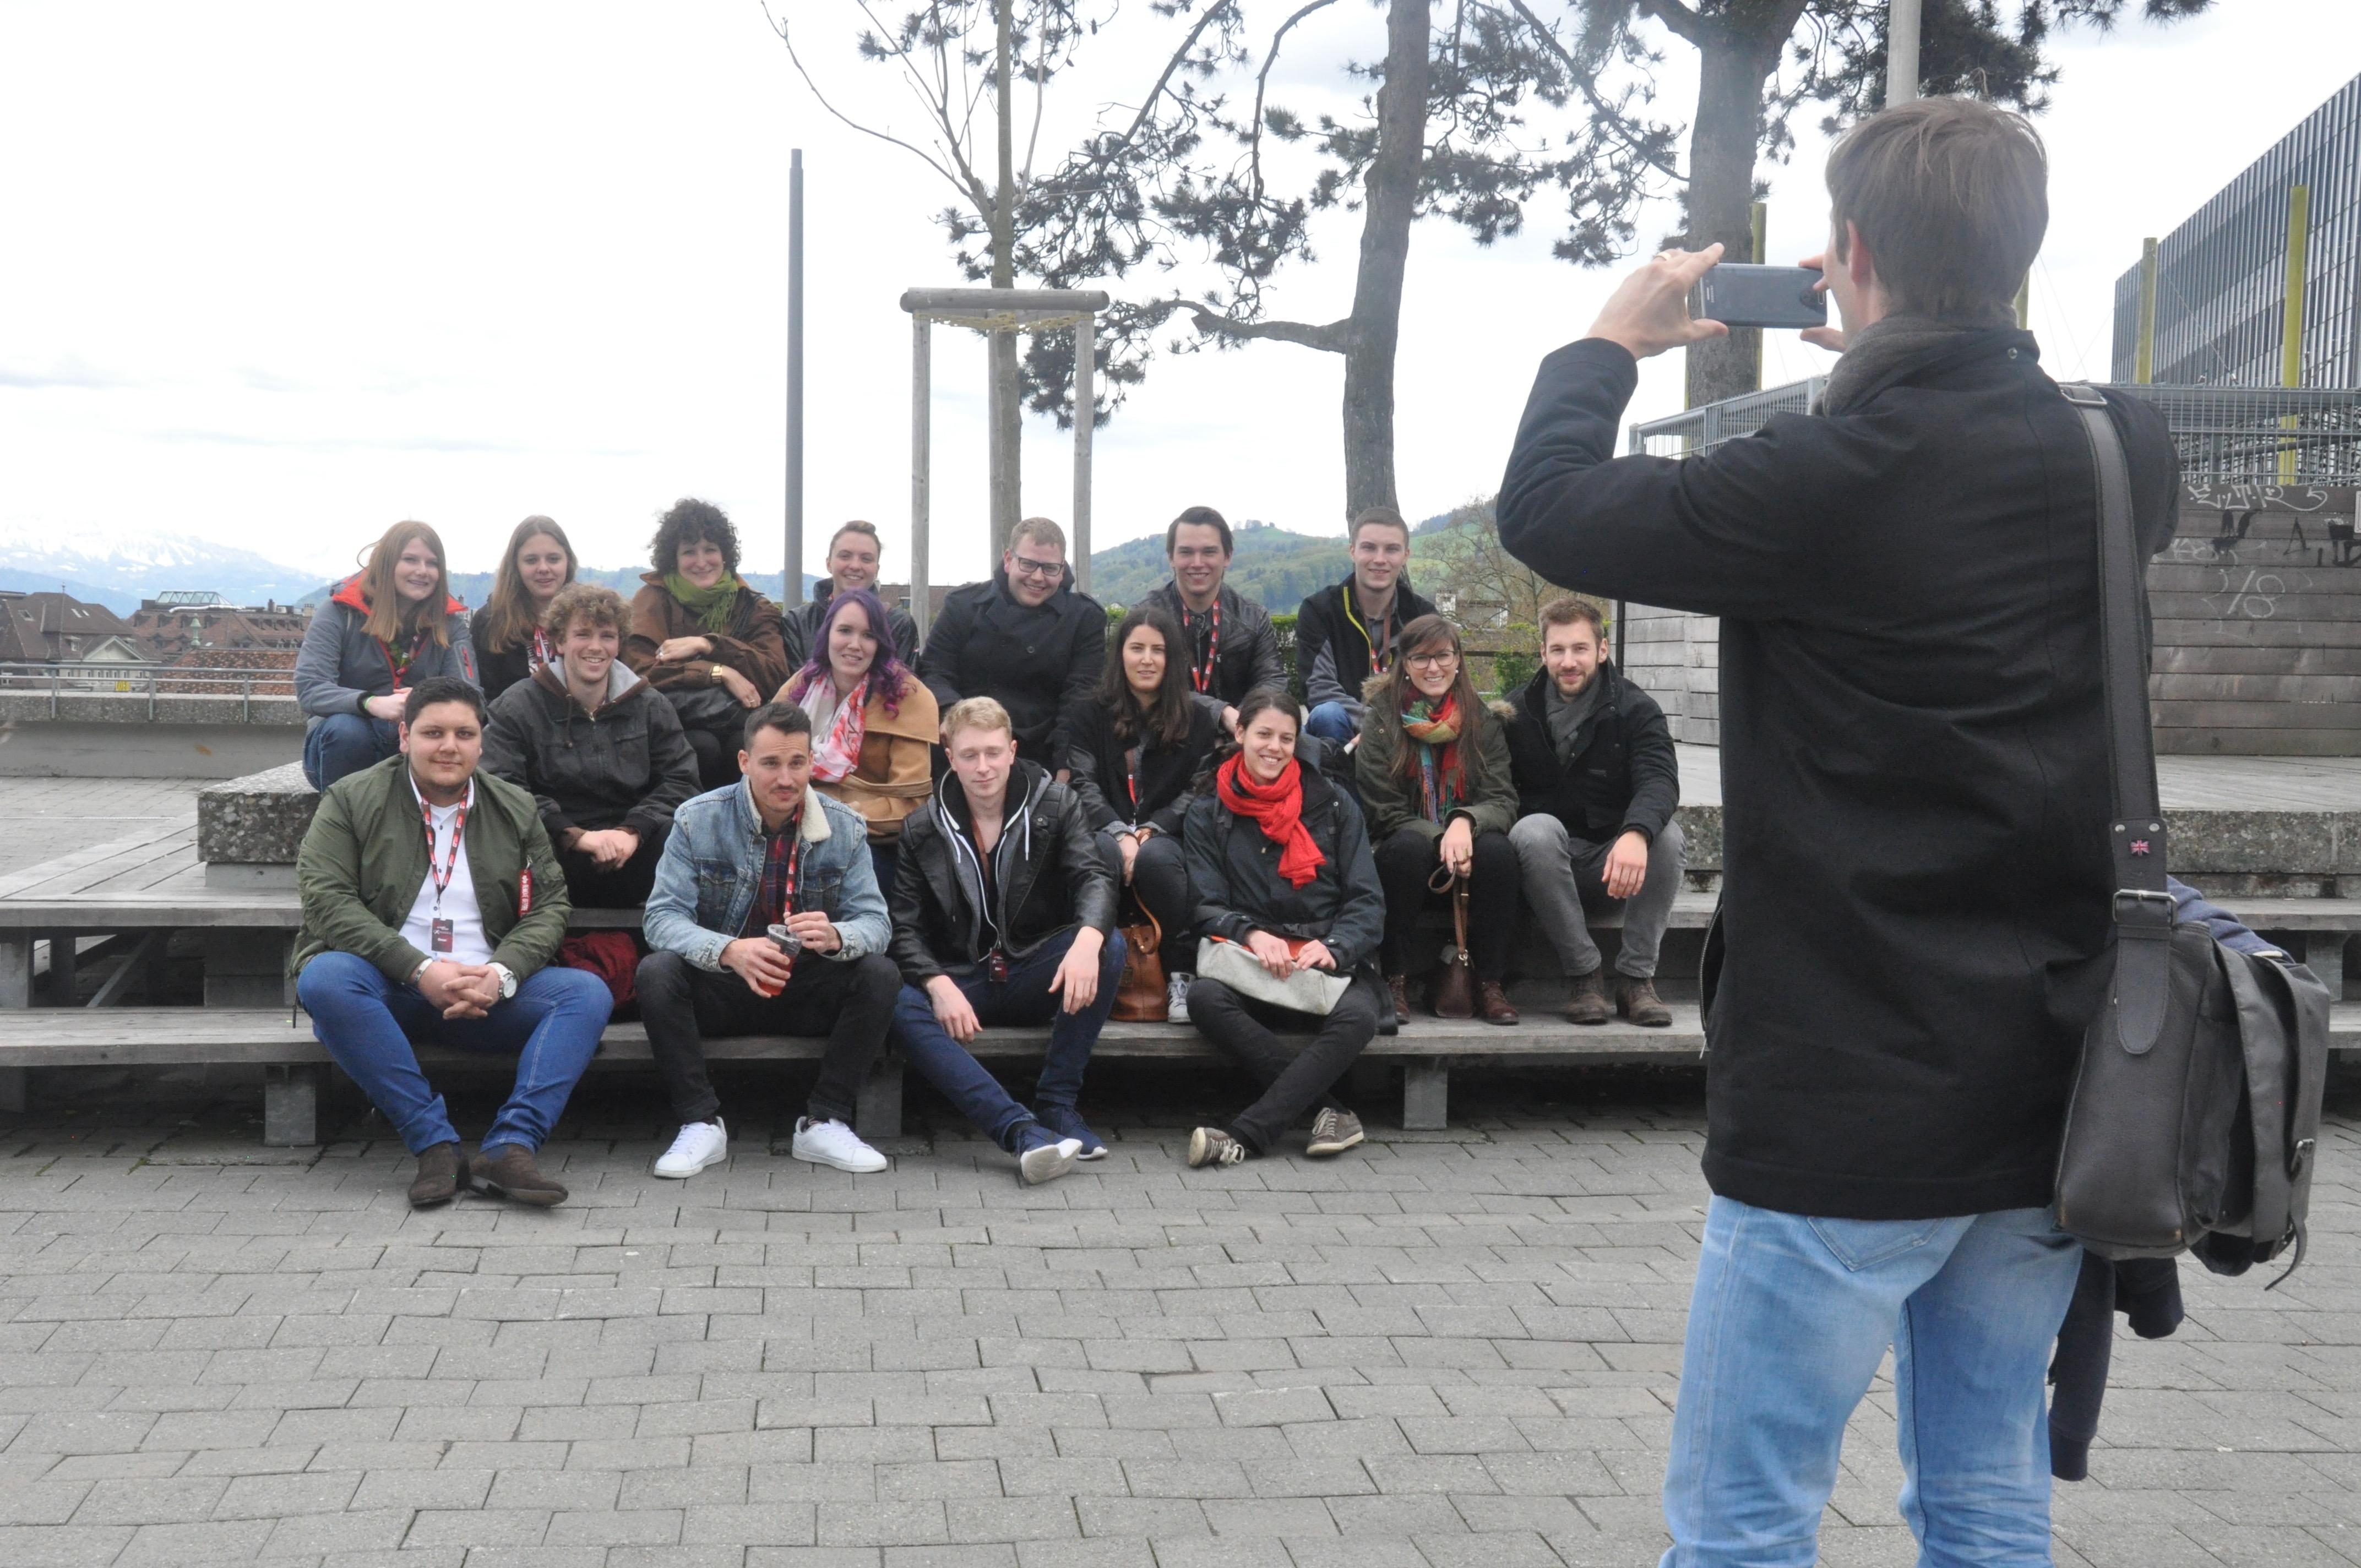 Gruppenfoto La Cuisine de Jeunes Mitglieder